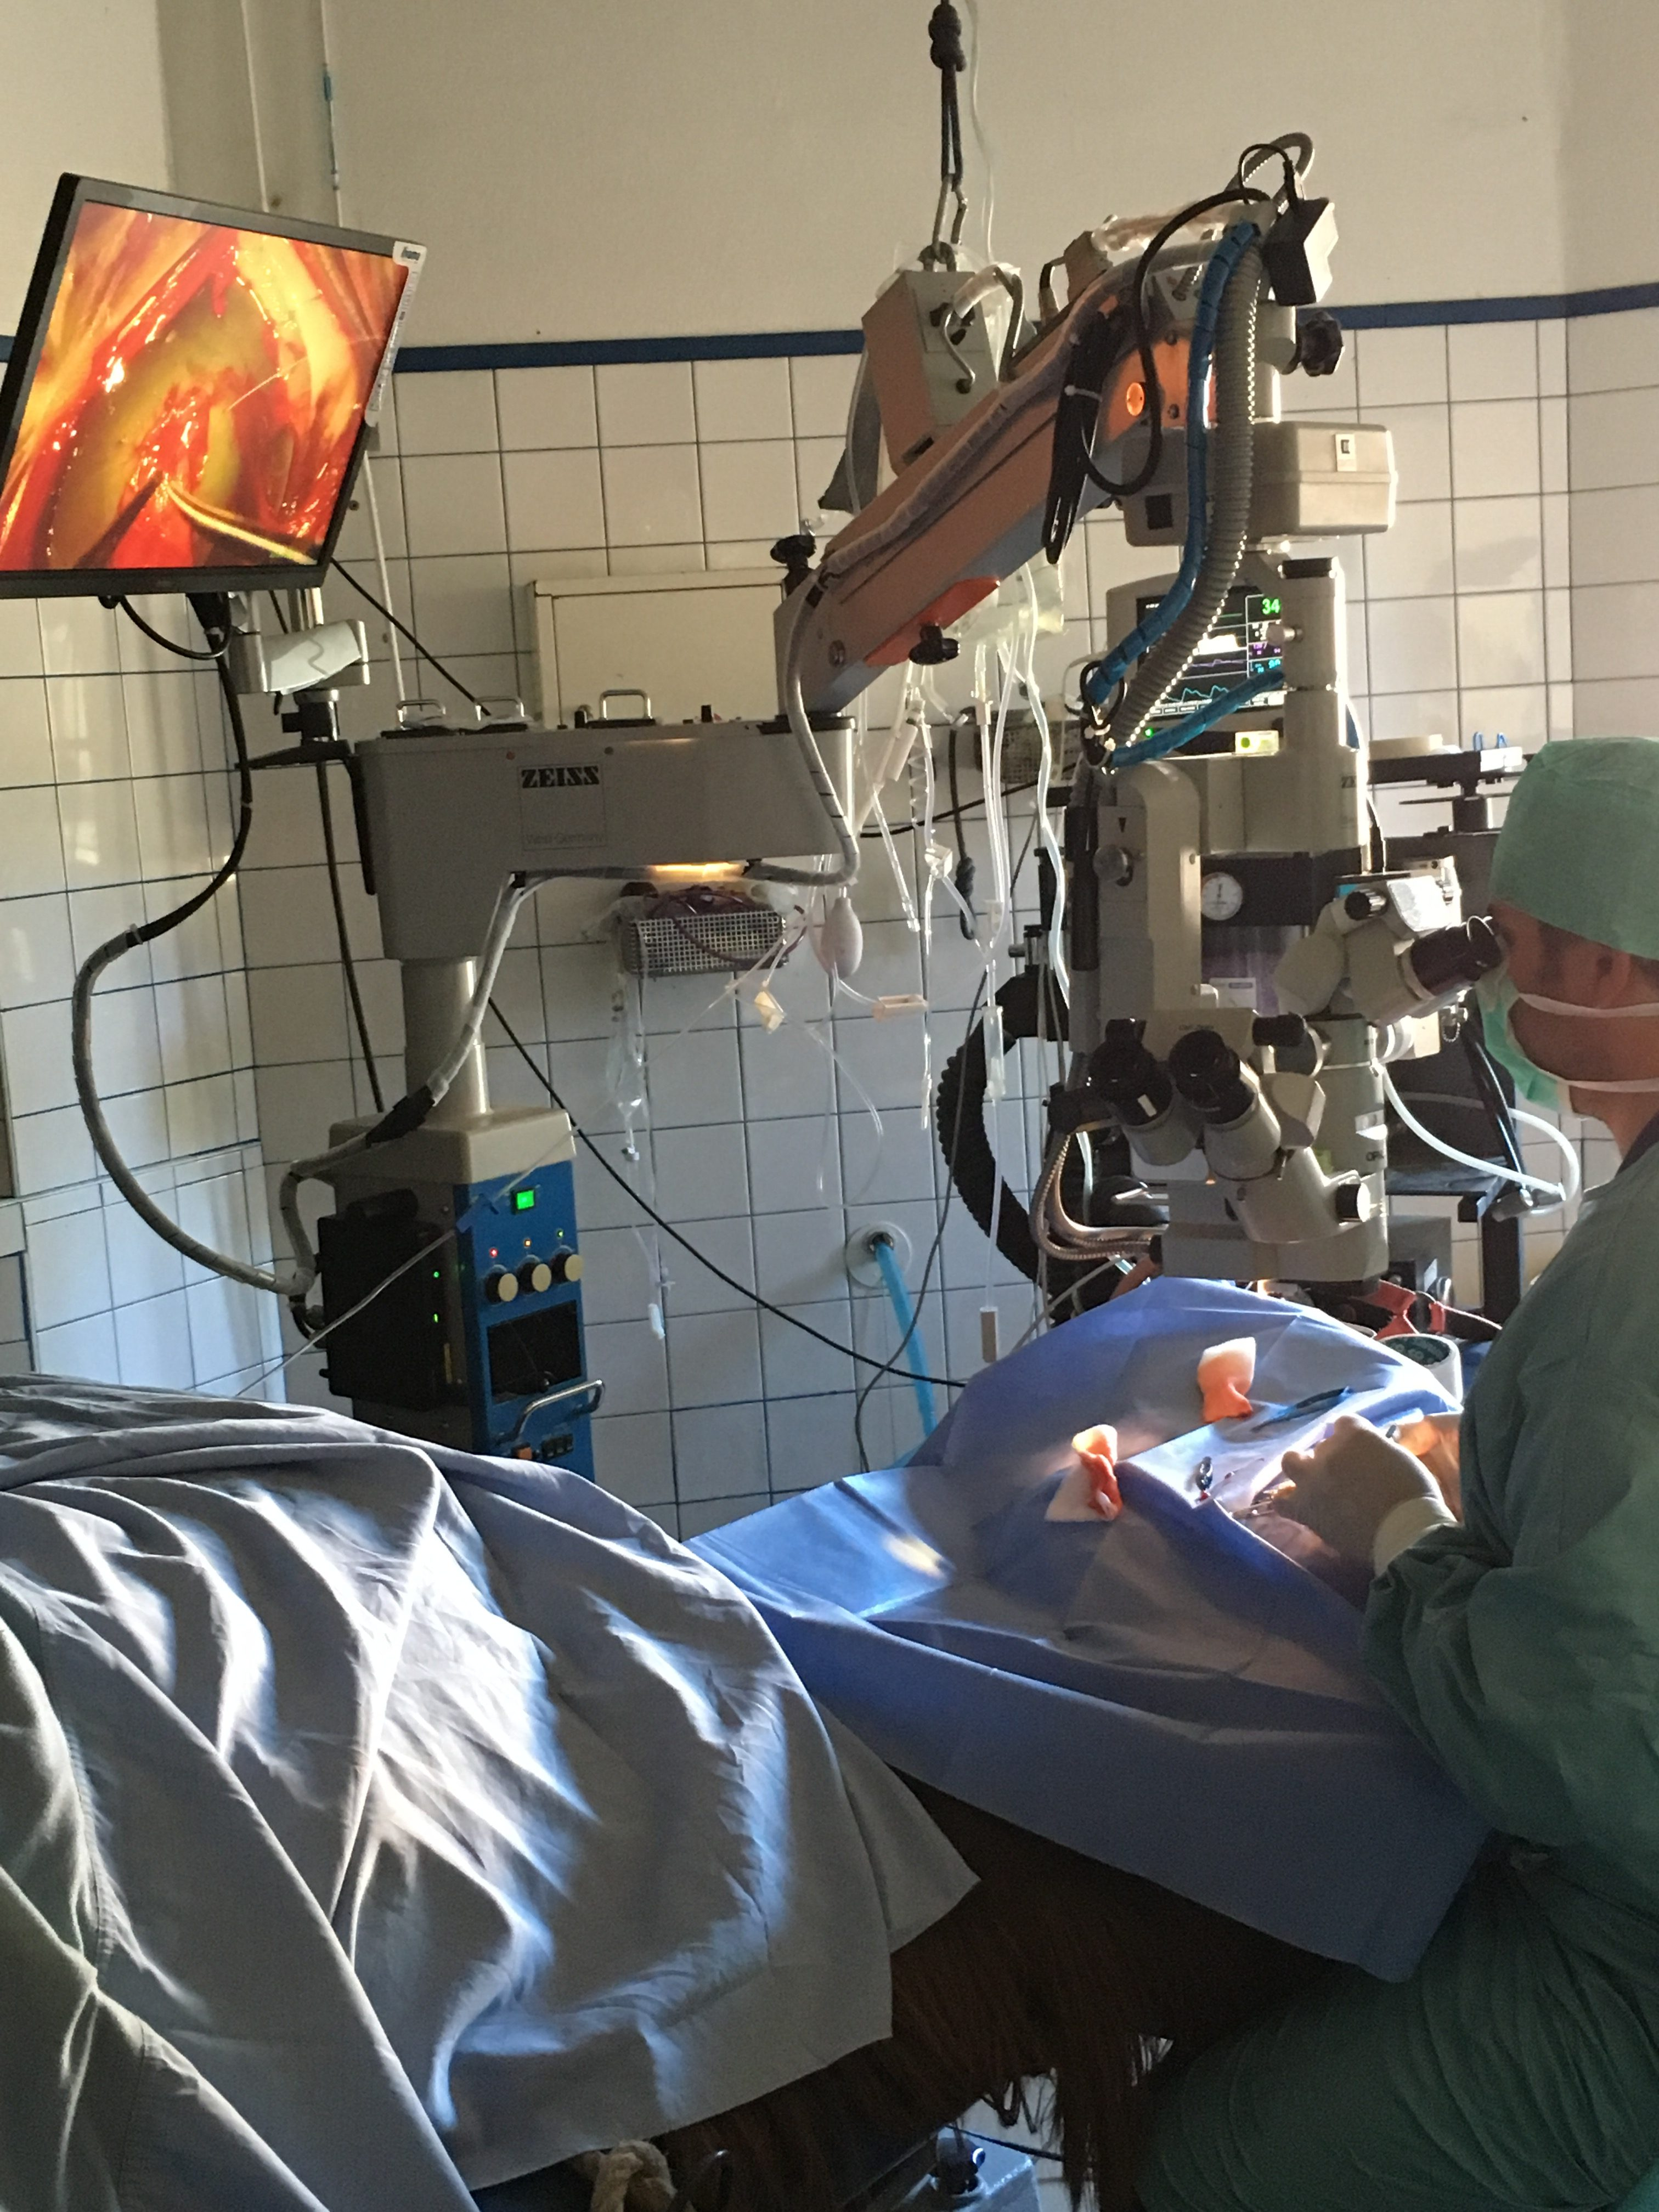 Chirurgie ophtalmologique sous microscope opératoire